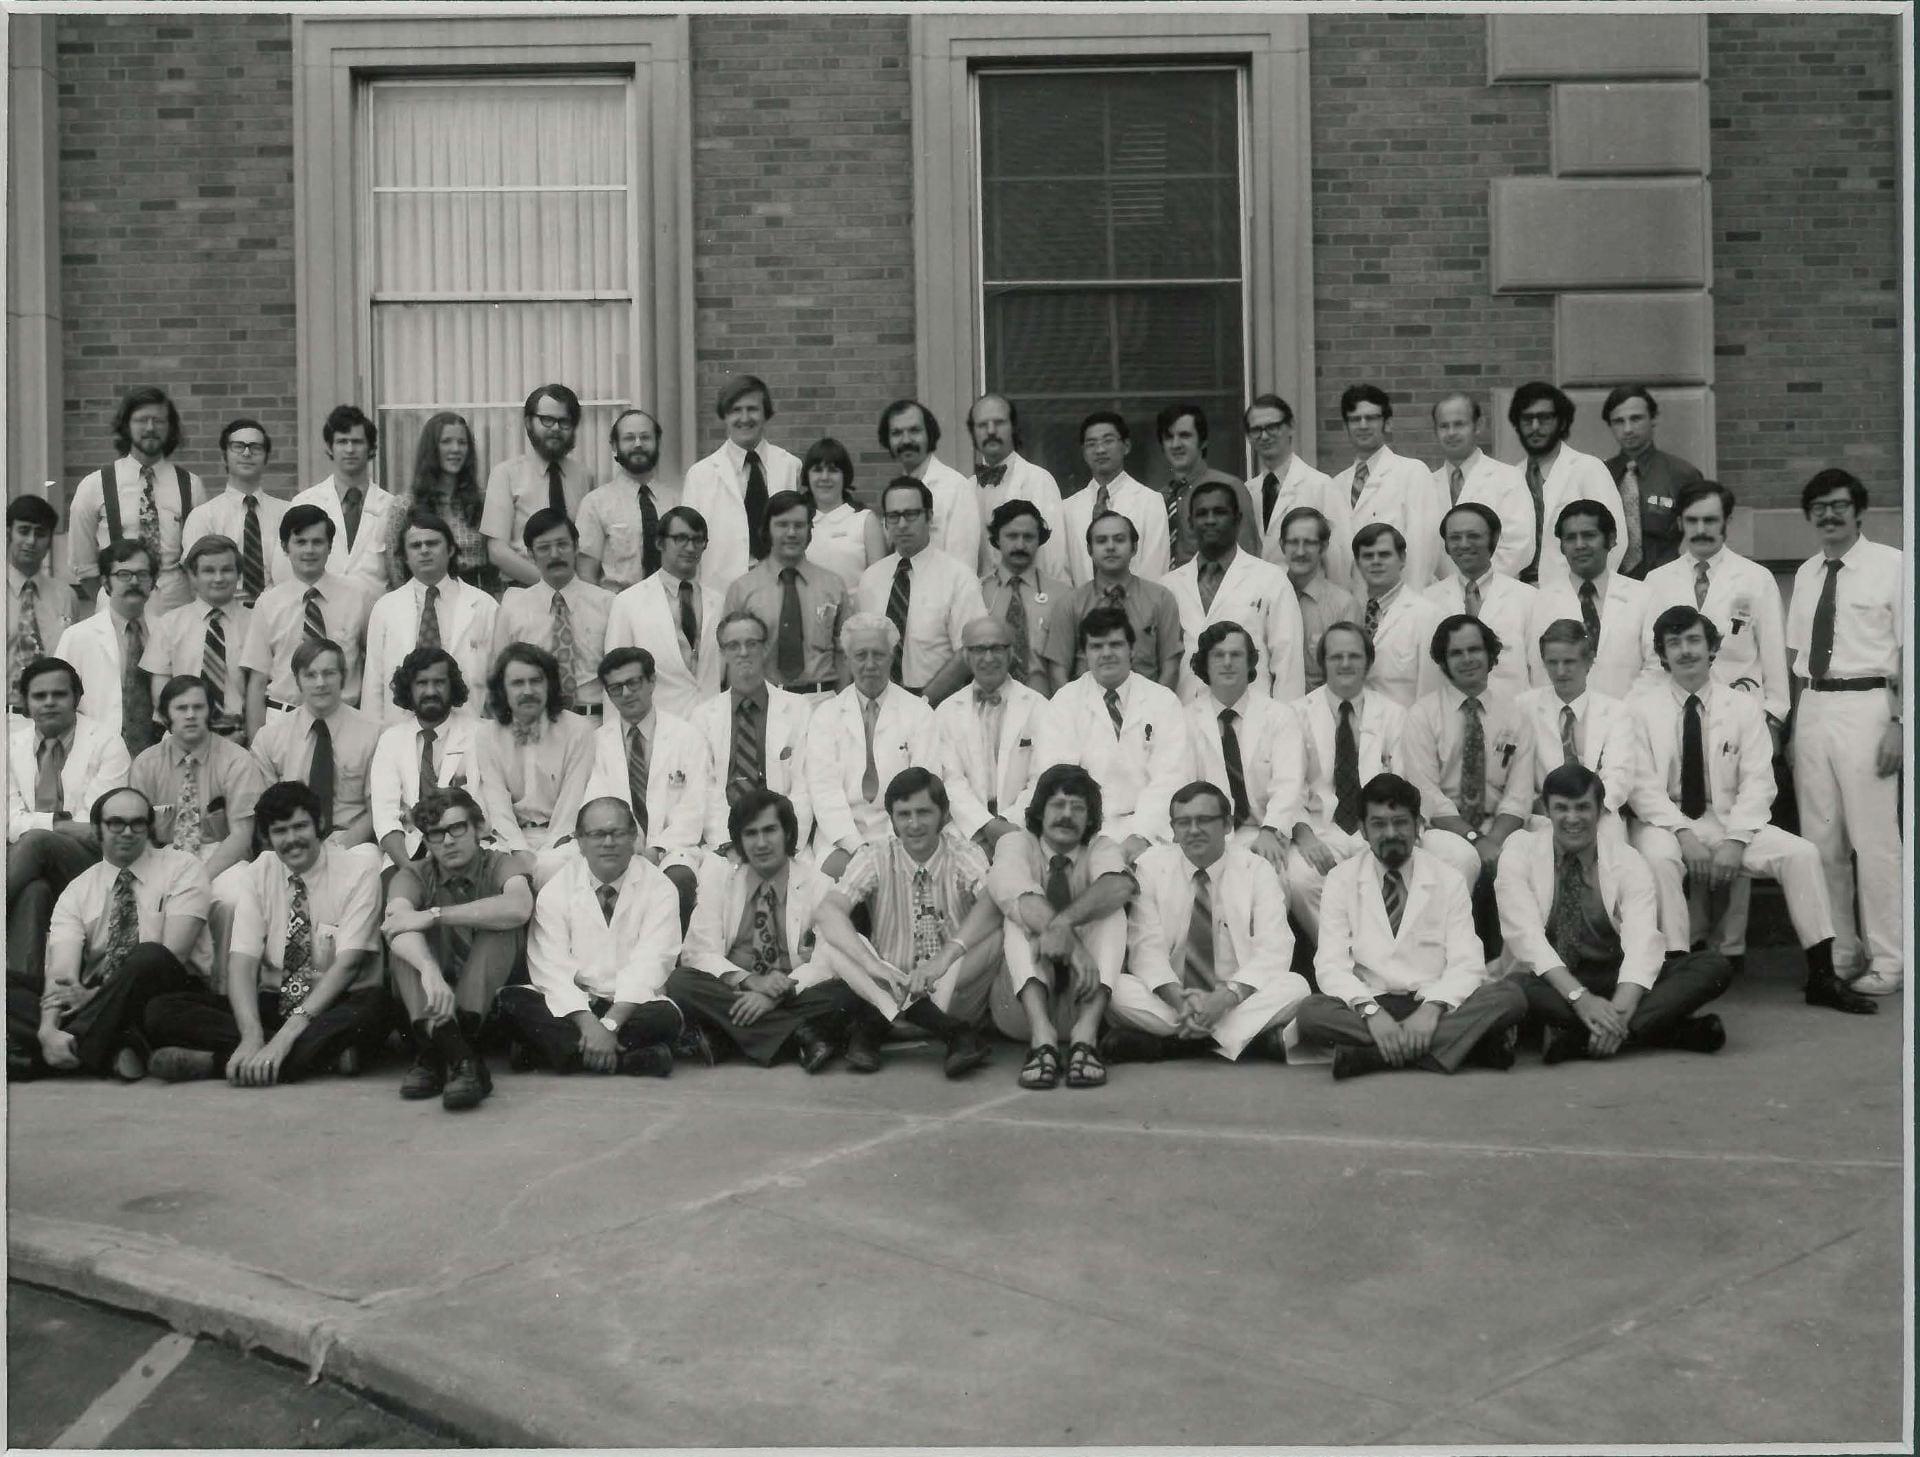 1971 Housestaff Photo